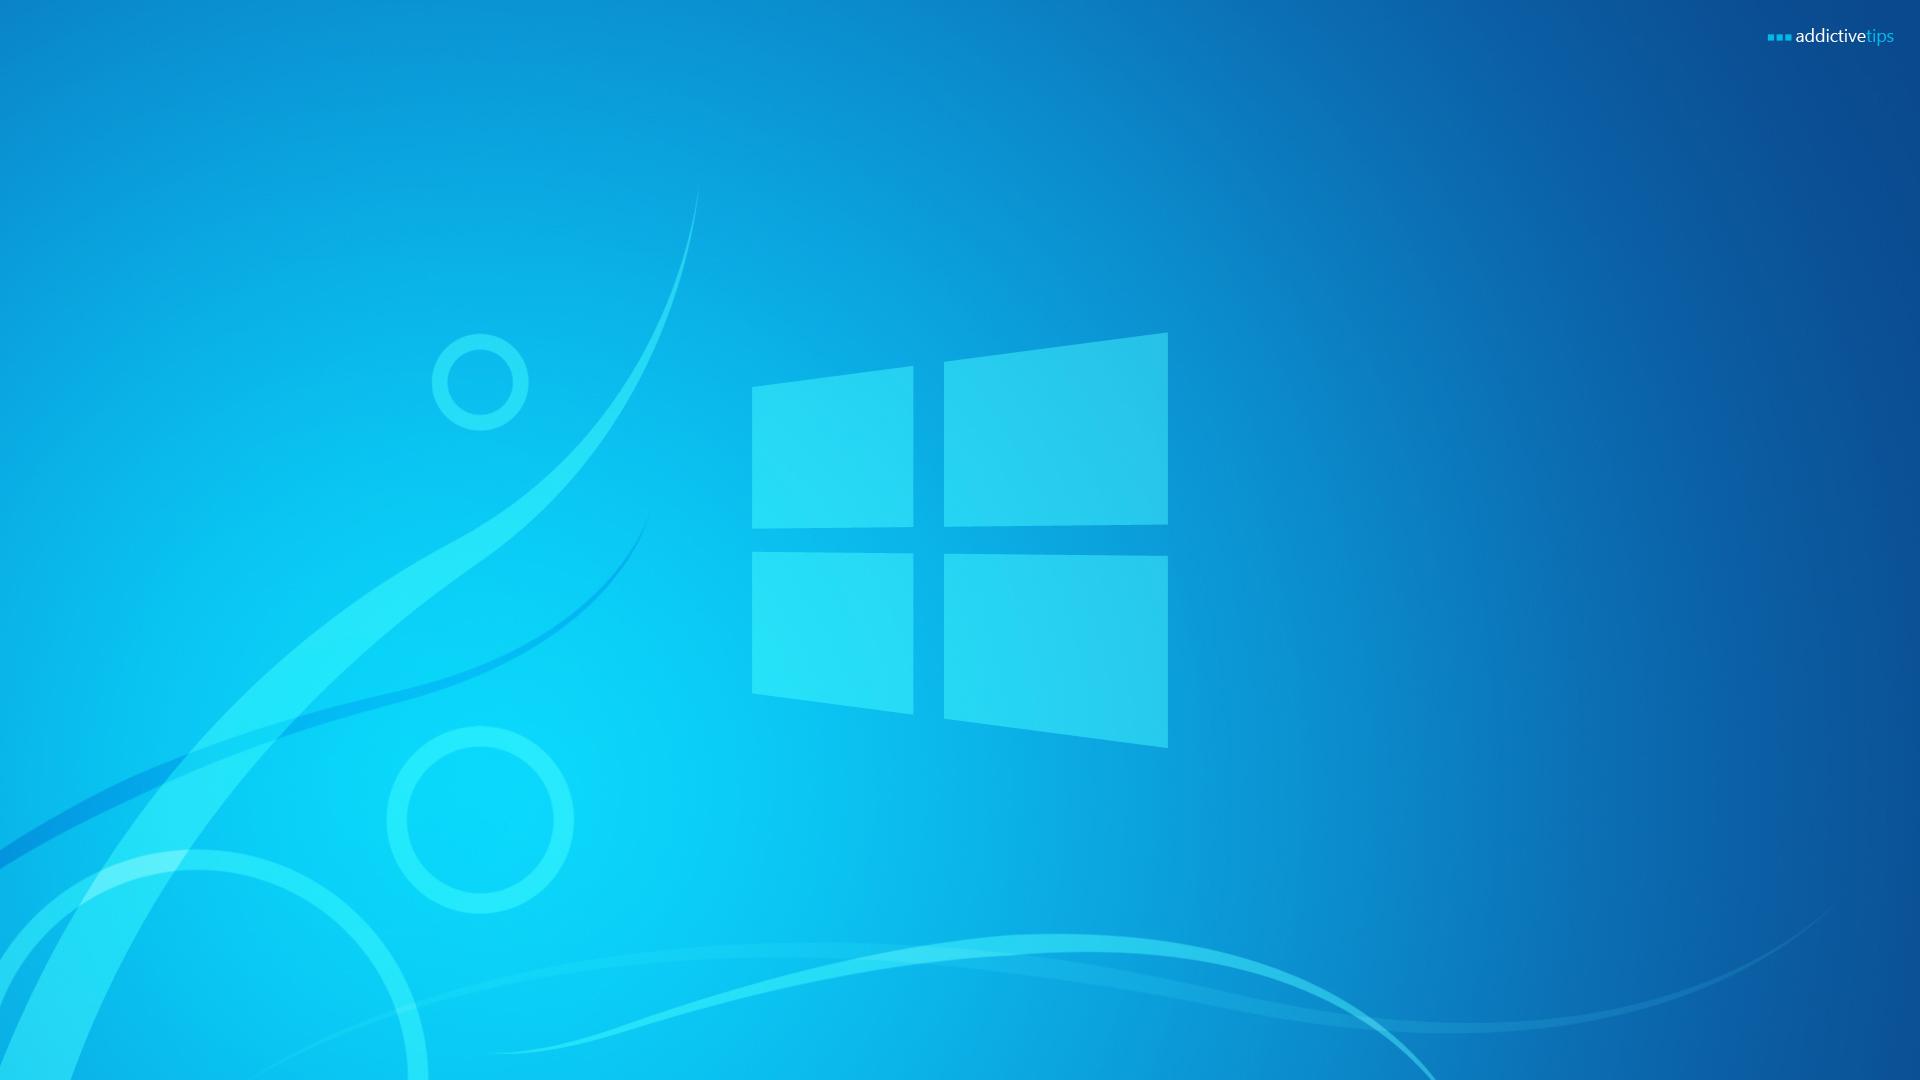 Windows 8 Background wallpaper 1920x1080 22296 1920x1080